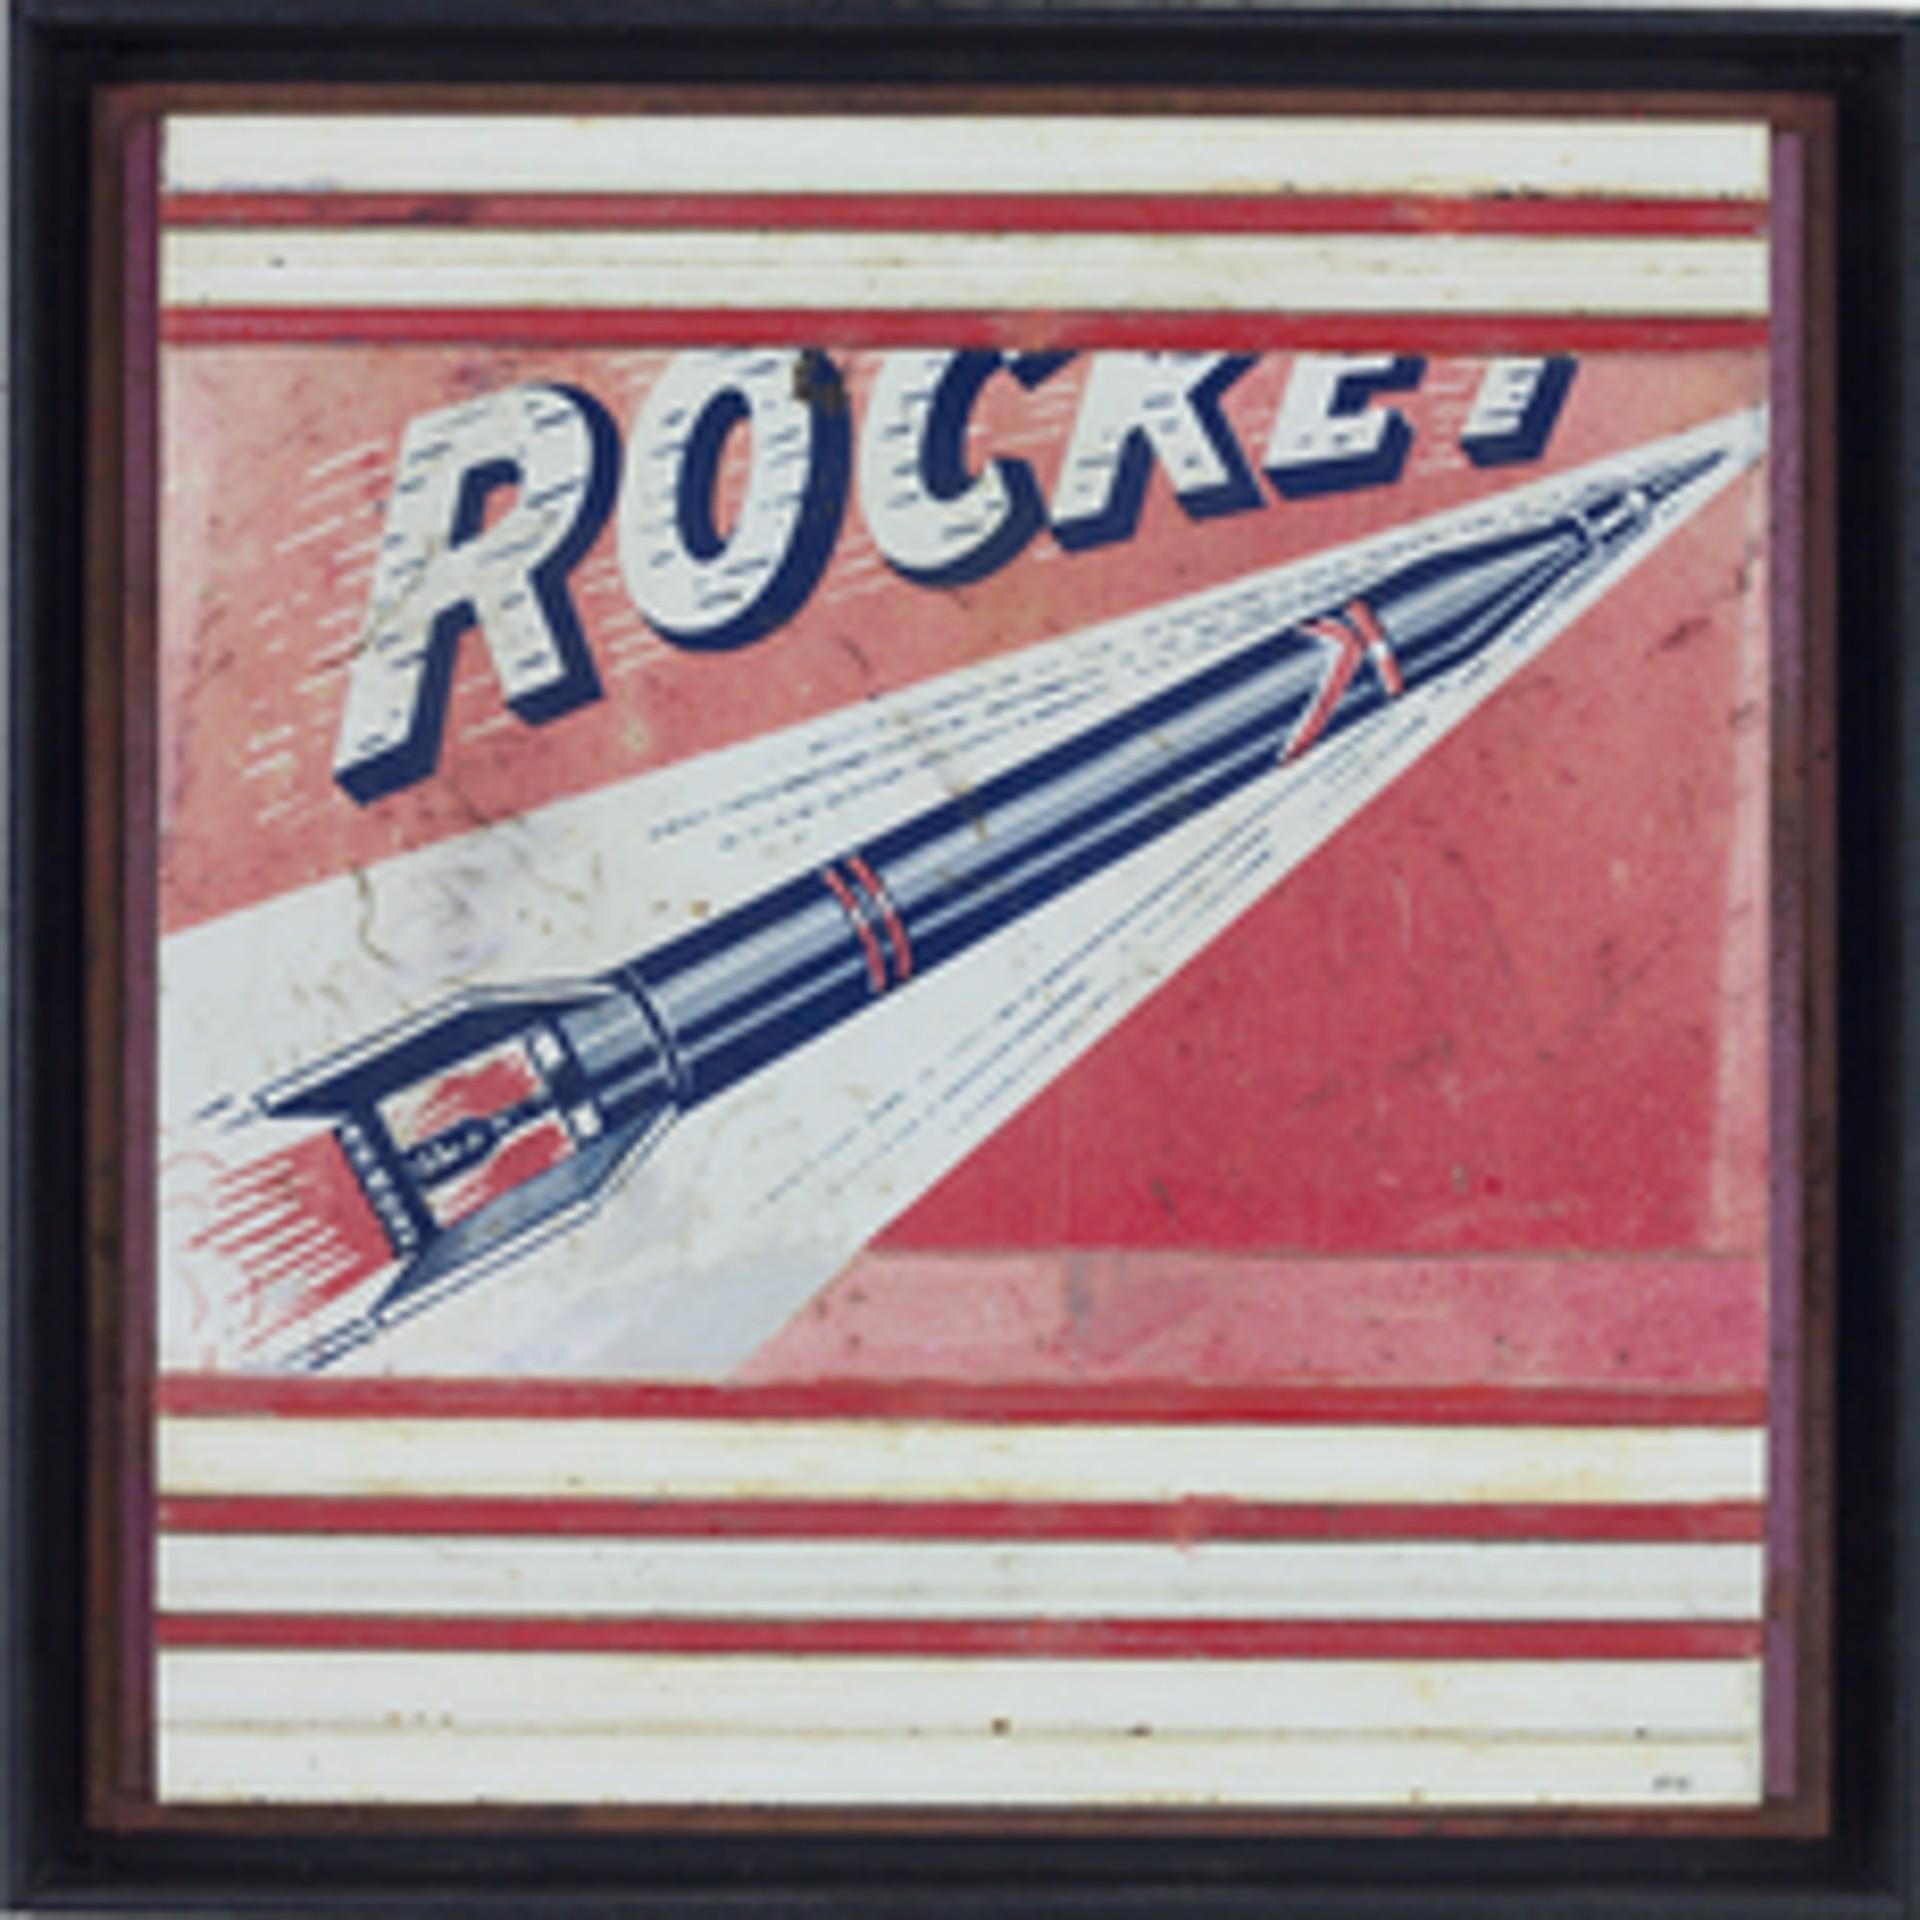 Rocket in Space by Randall Reid